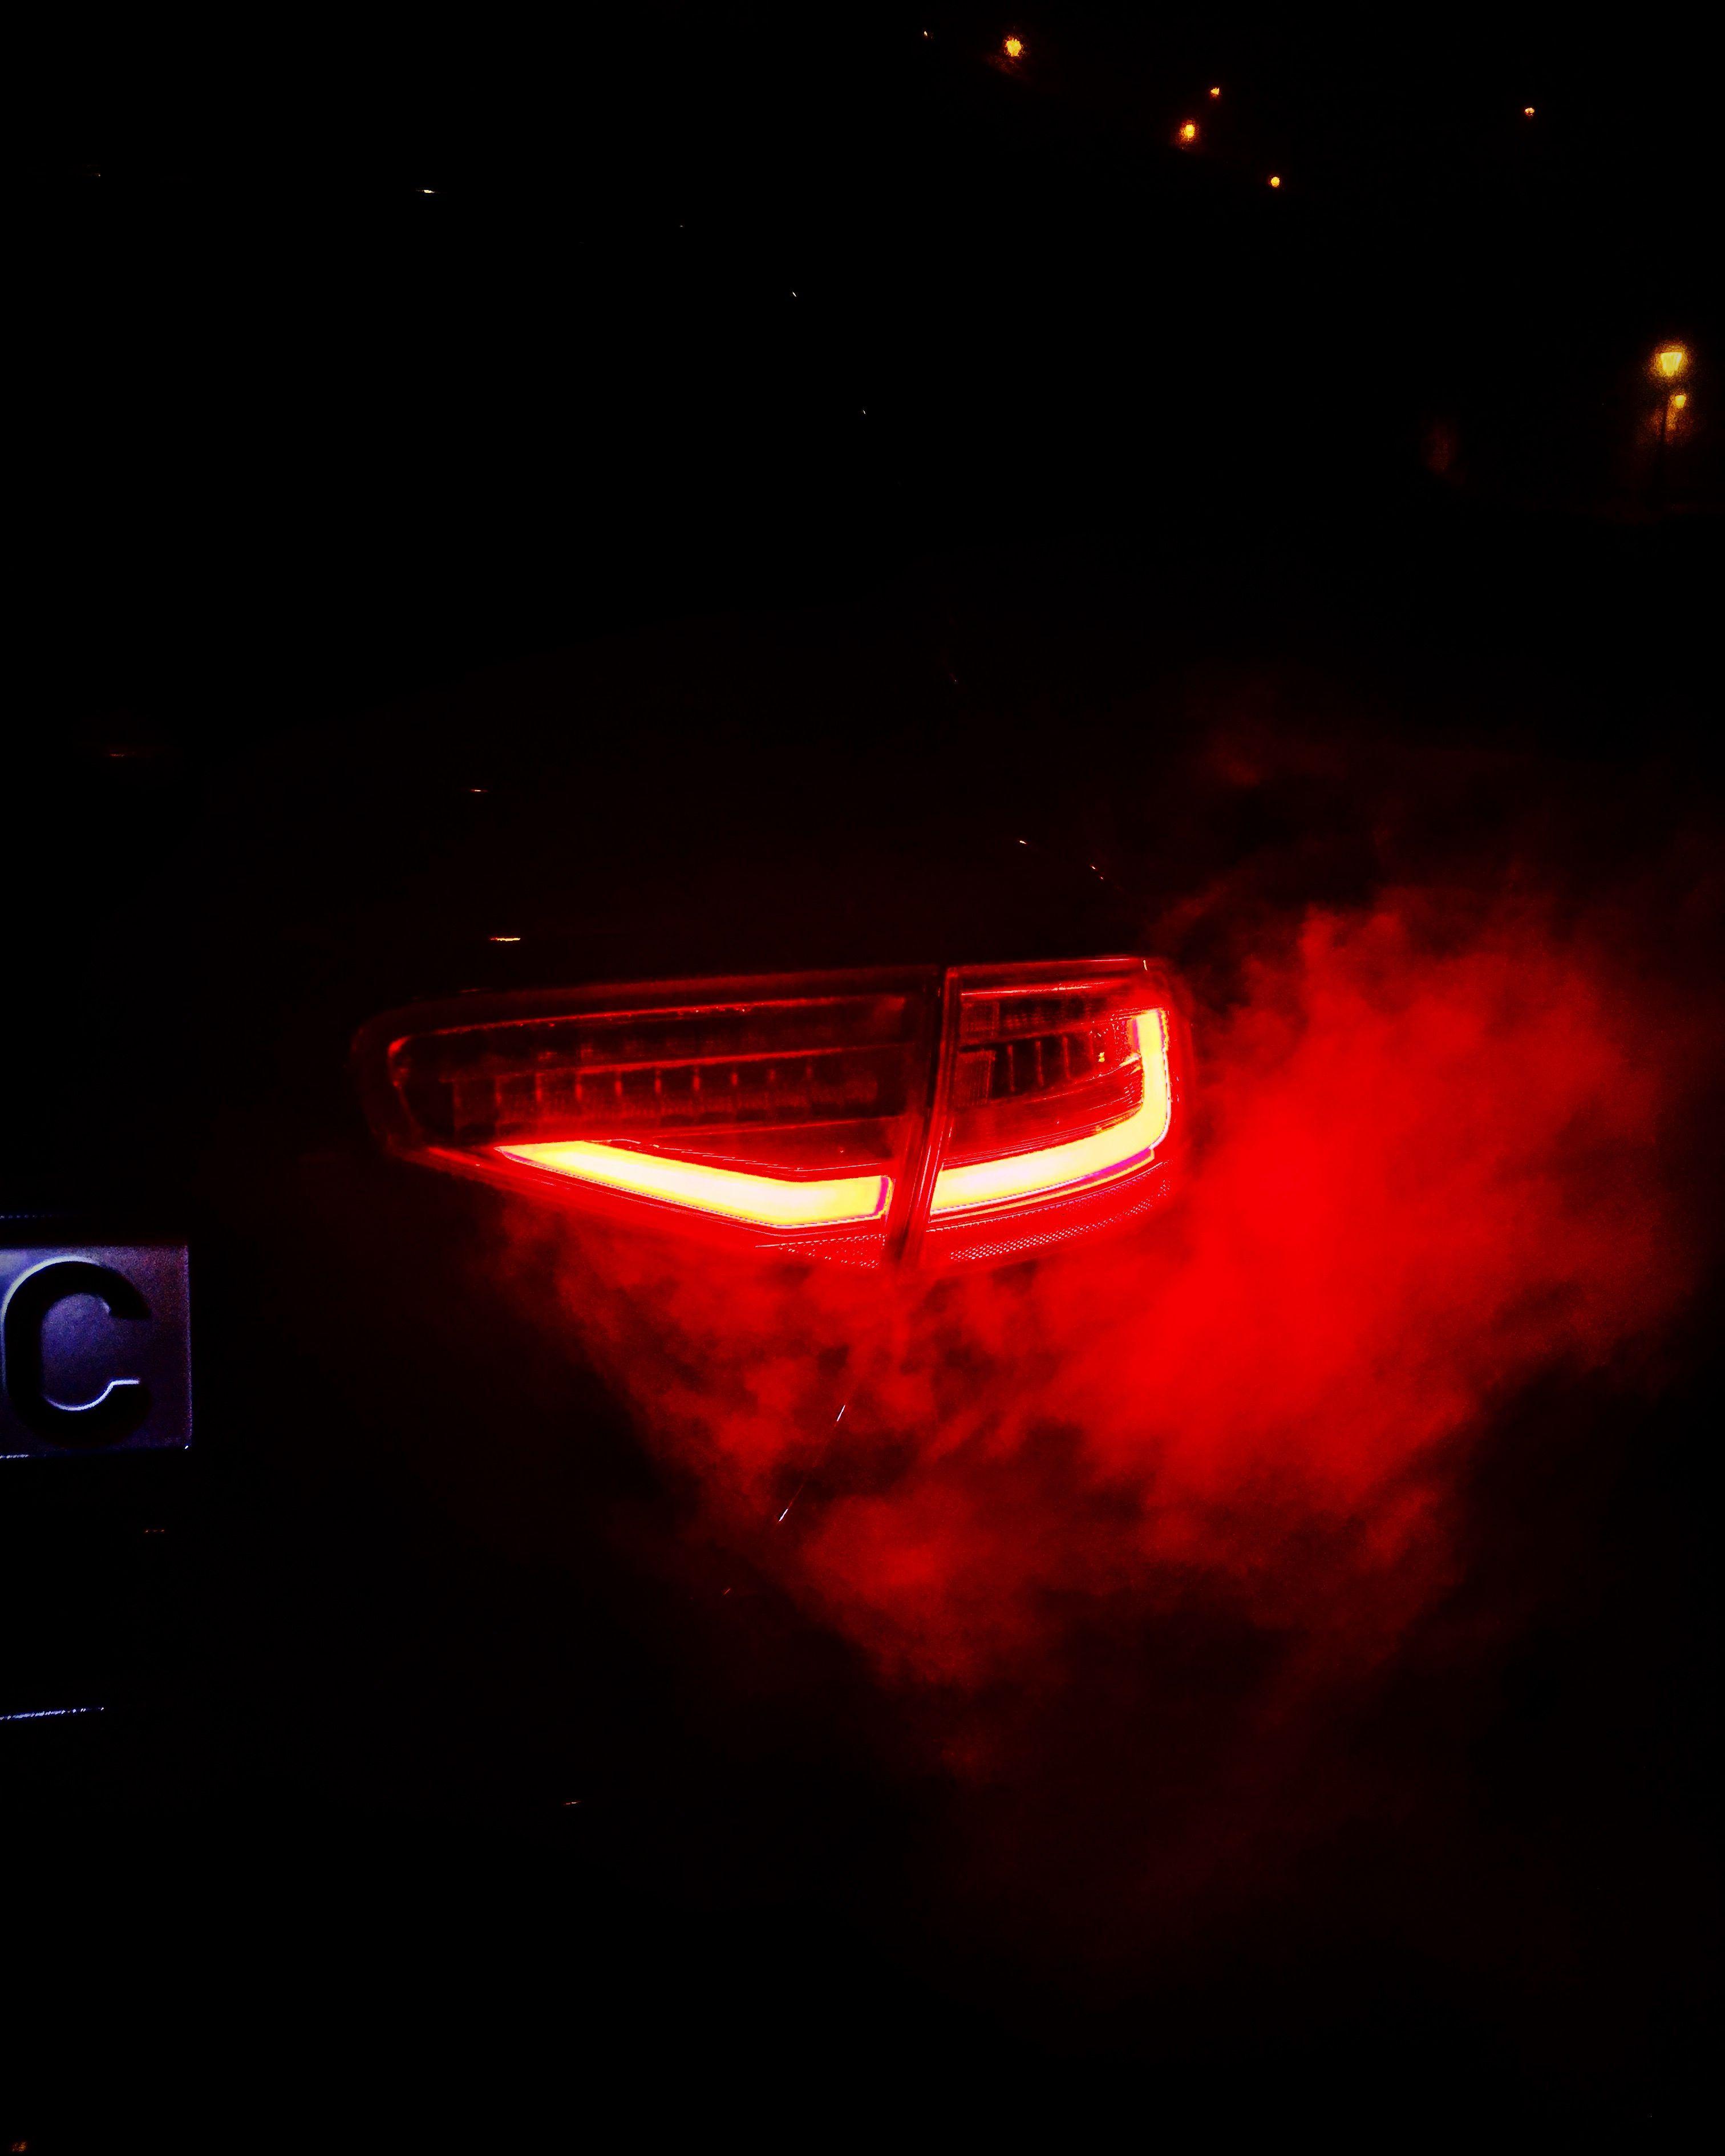 audi a4 night fog black b8 cars pinterest audi a4 audi and cars